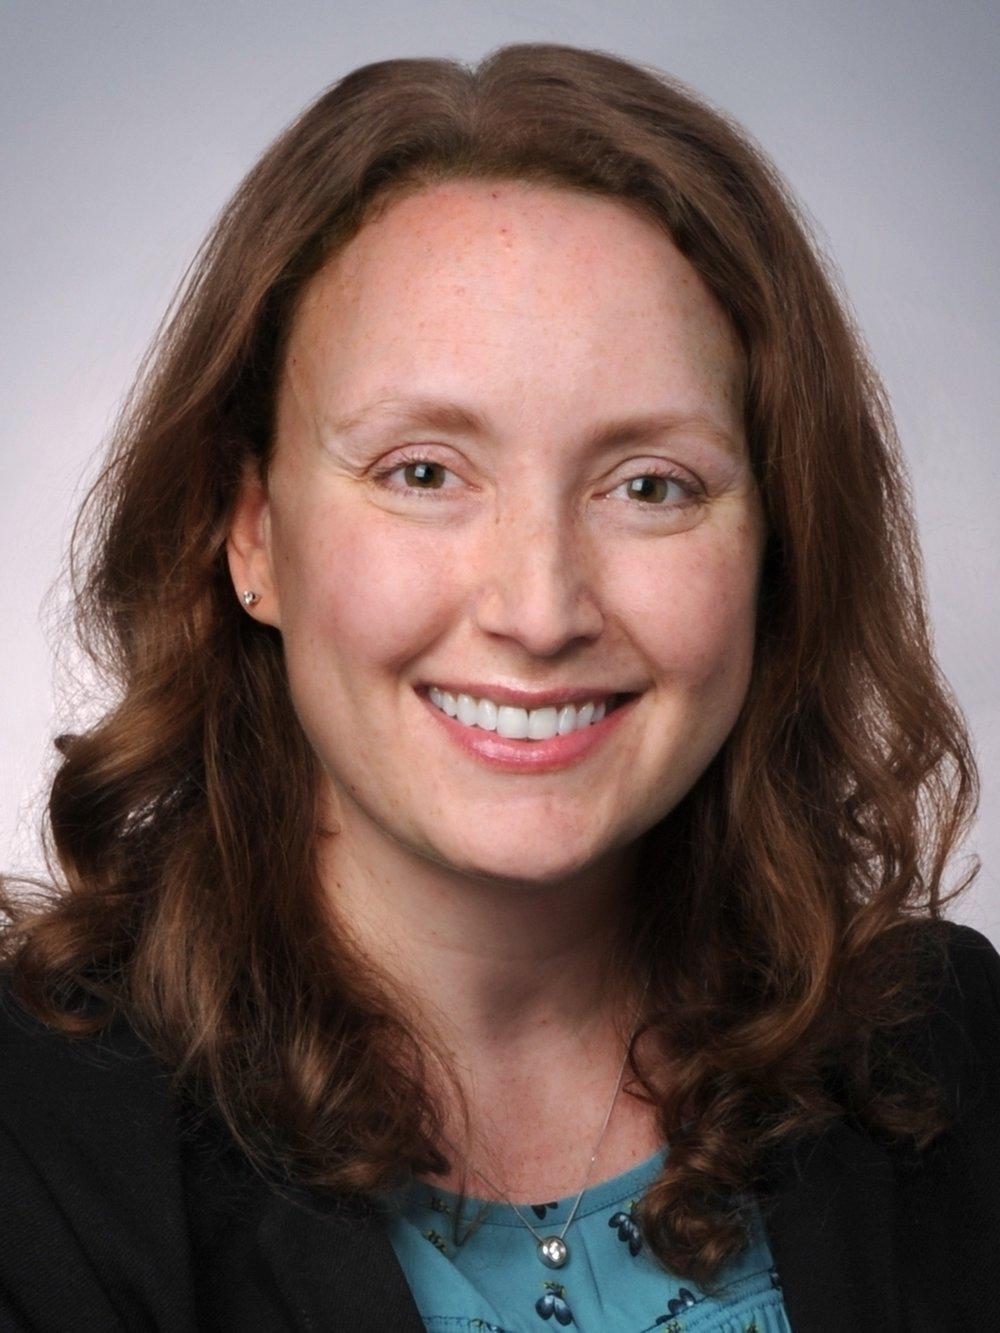 Dr. Lizite Salzman, PsyD, HSPP